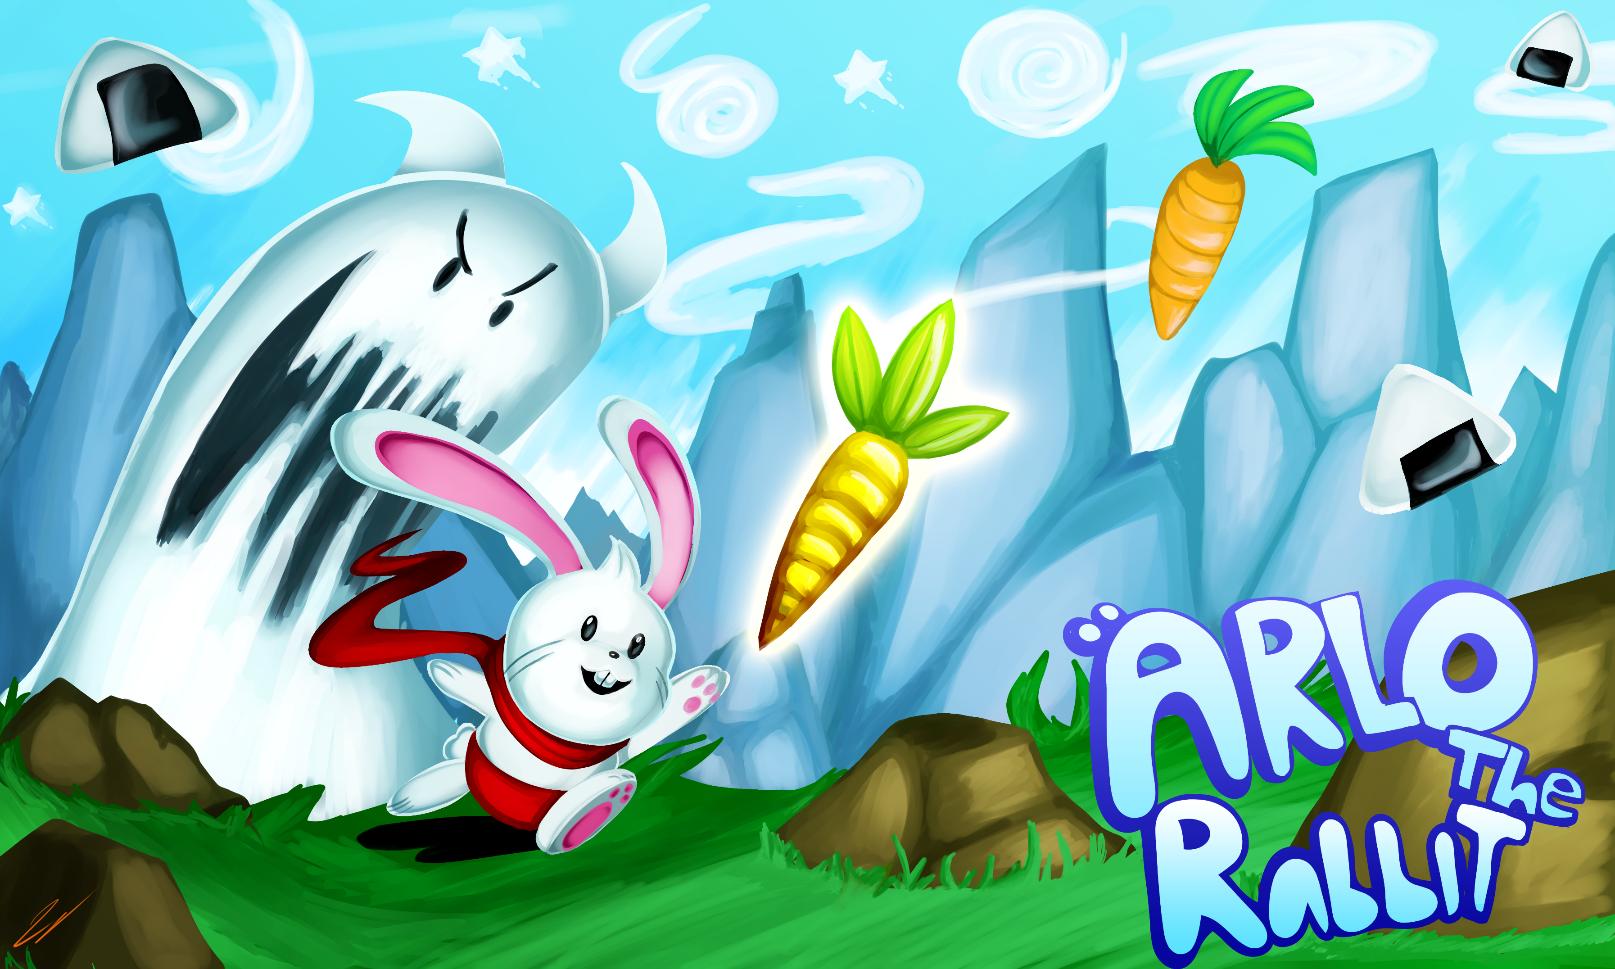 Arlo The Rabbit